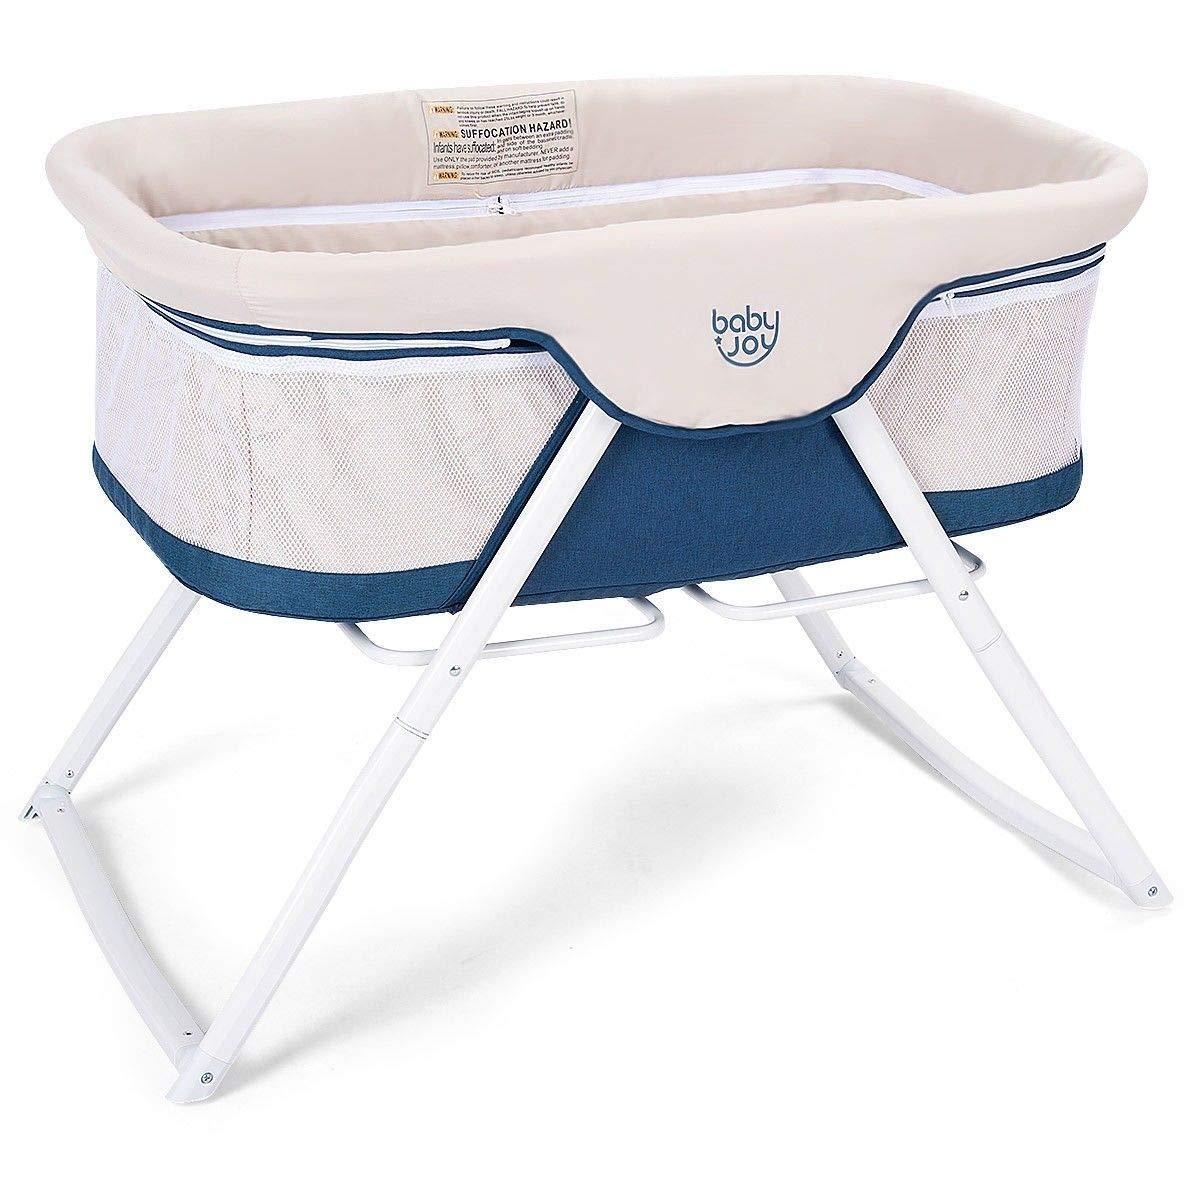 Rungfa Foldaway Baby Bassinet Crib Newborn Rocking Sleeper Traveler Portable with Bag by Rungfa